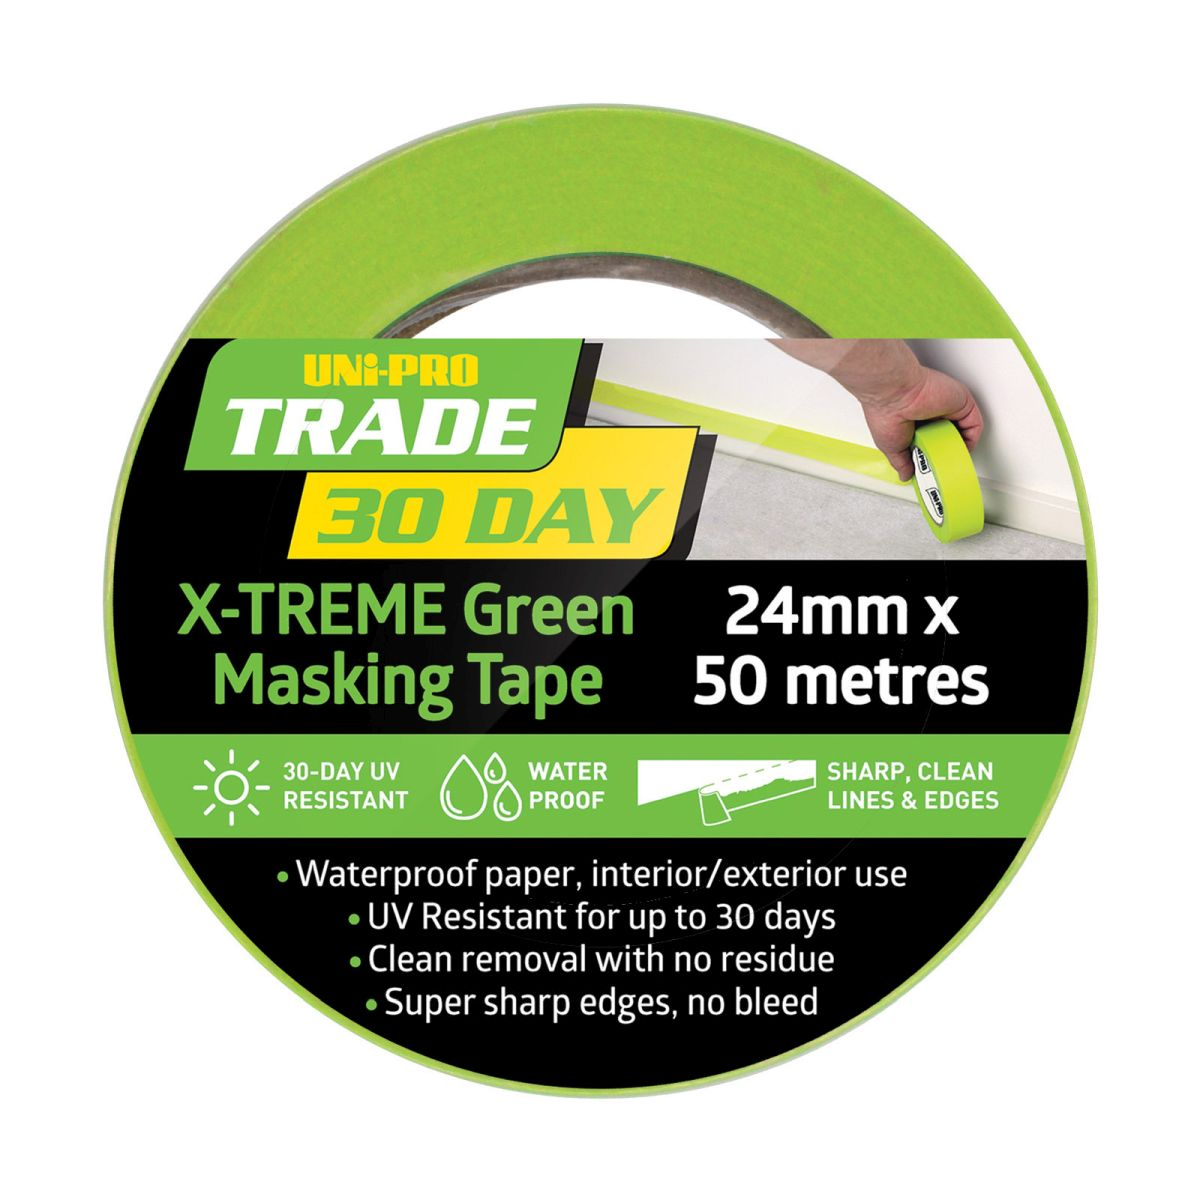 Uni-Pro Trade 30 Day X-TREME Green Masking Tape 48mm x 50m